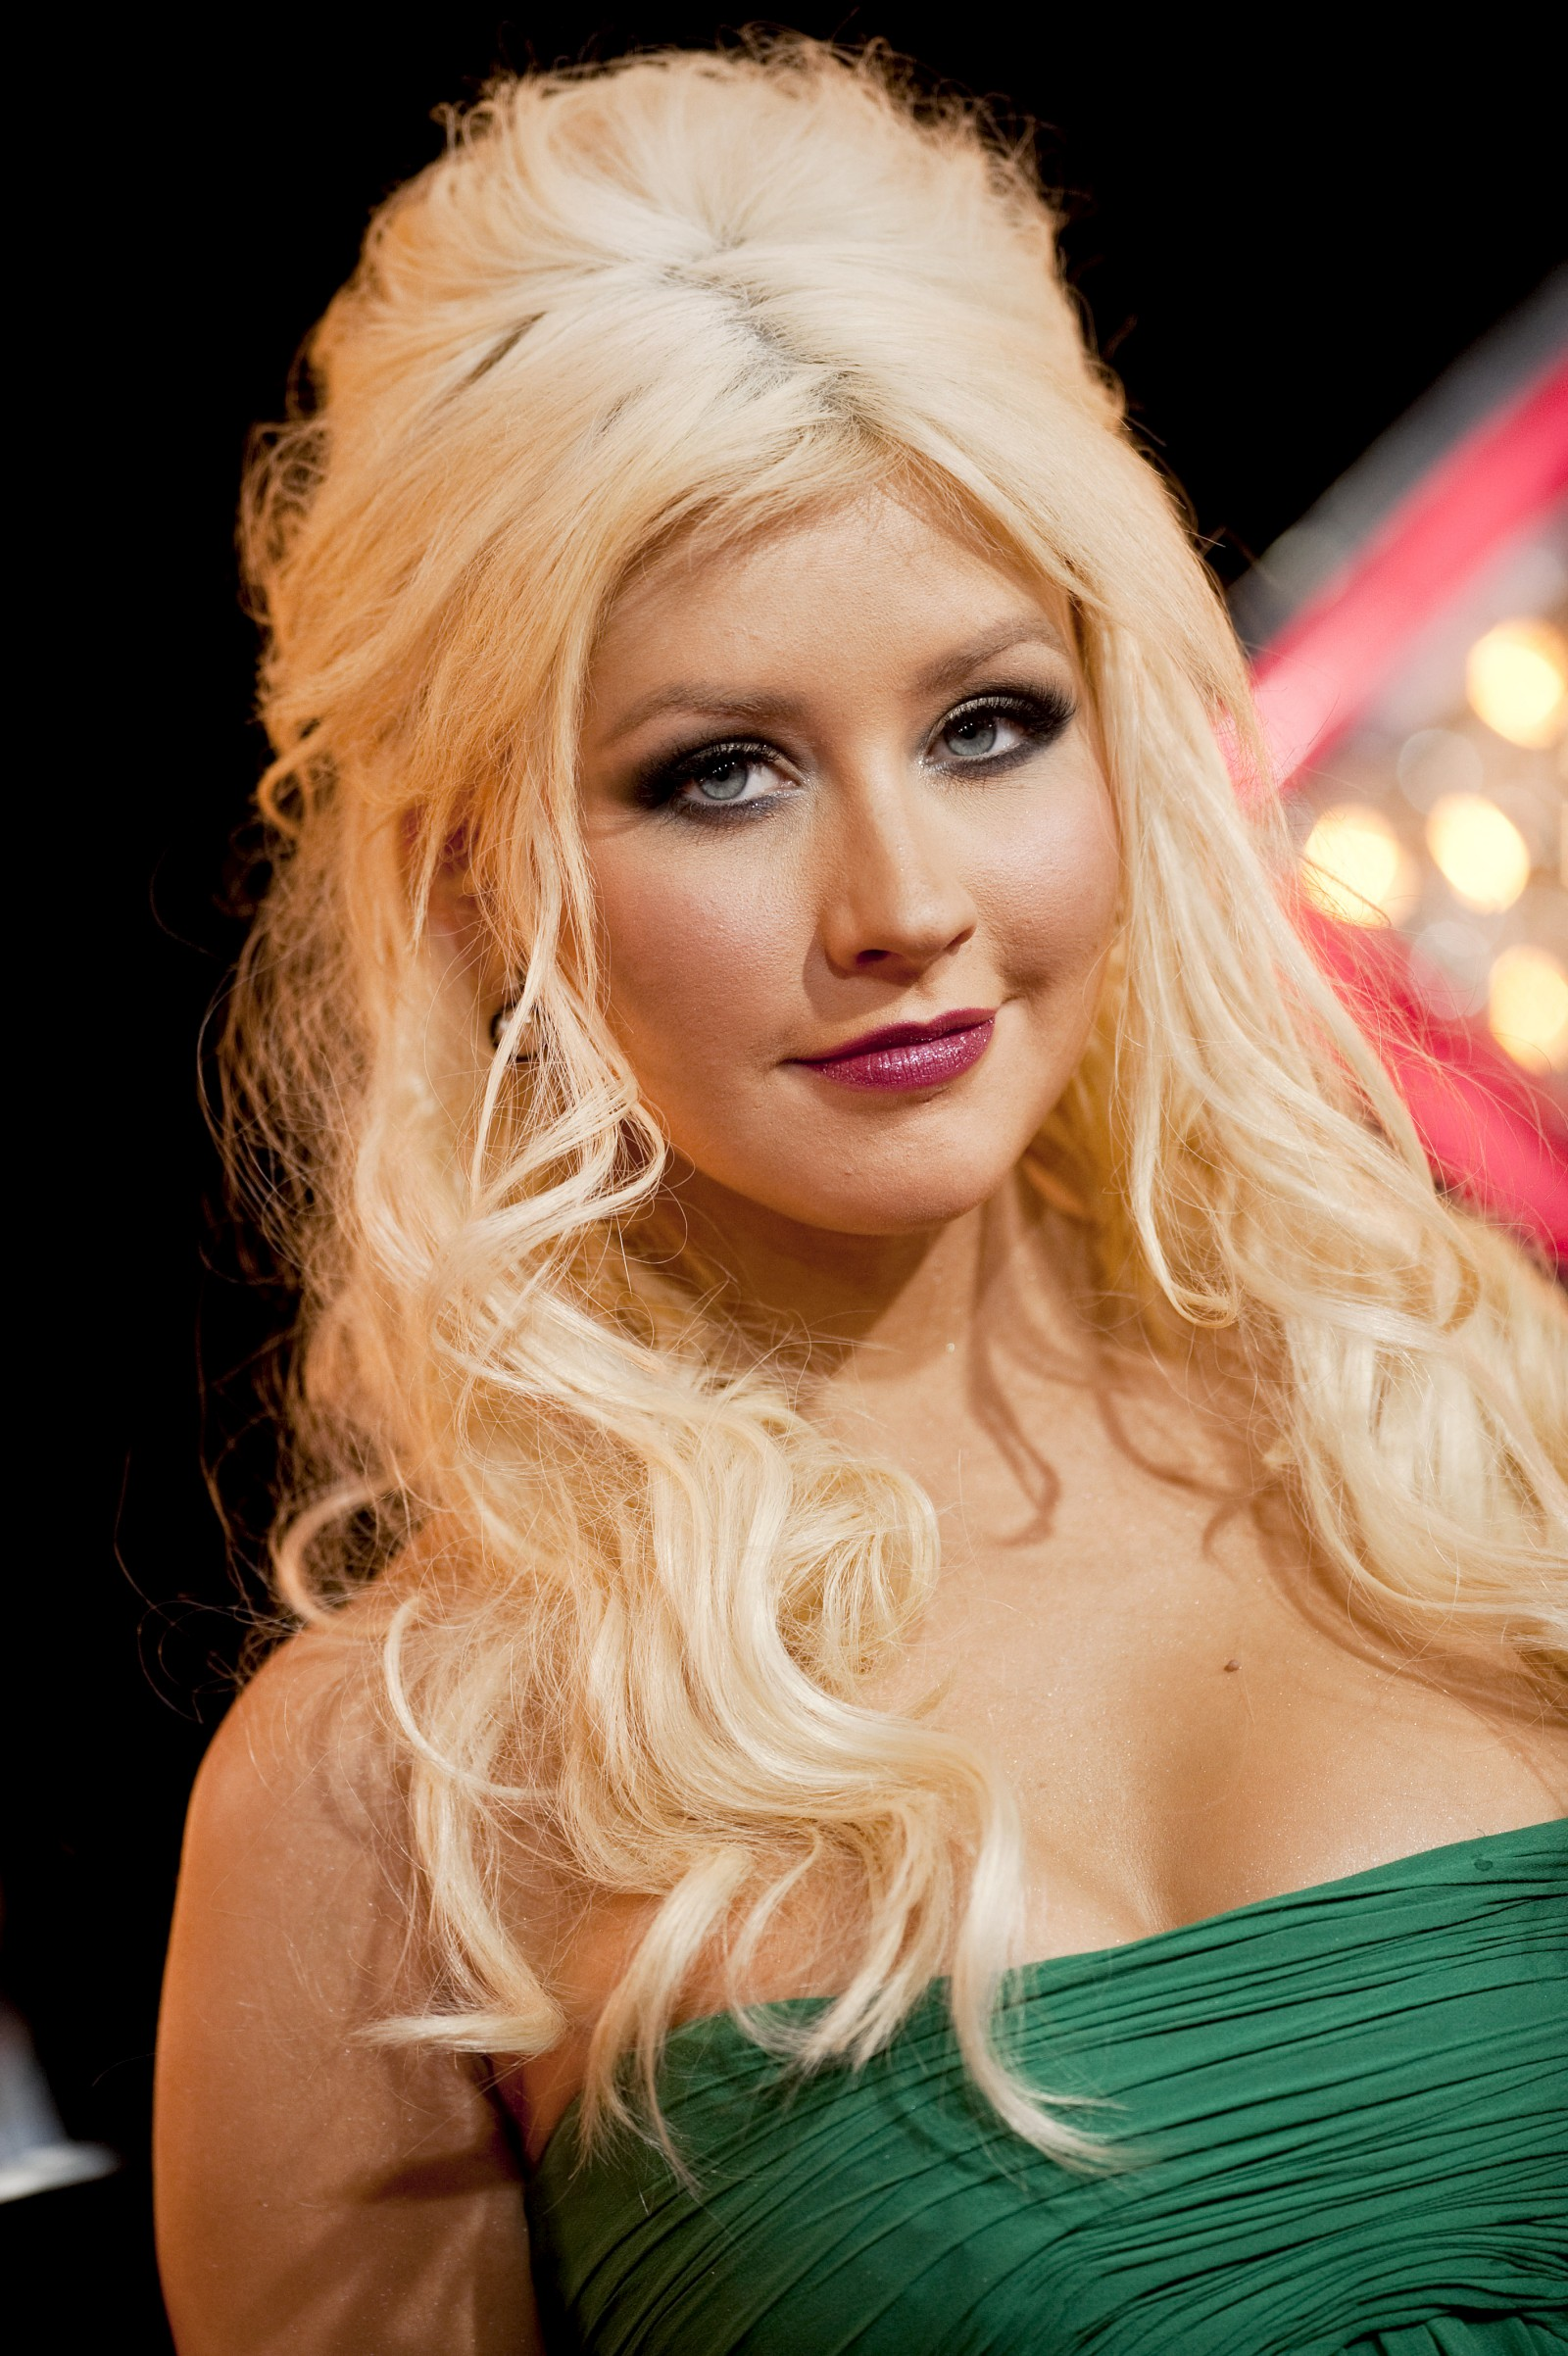 Christina Aguilera Burlesque on Pinterest | Christina ... Christina Aguilera Google